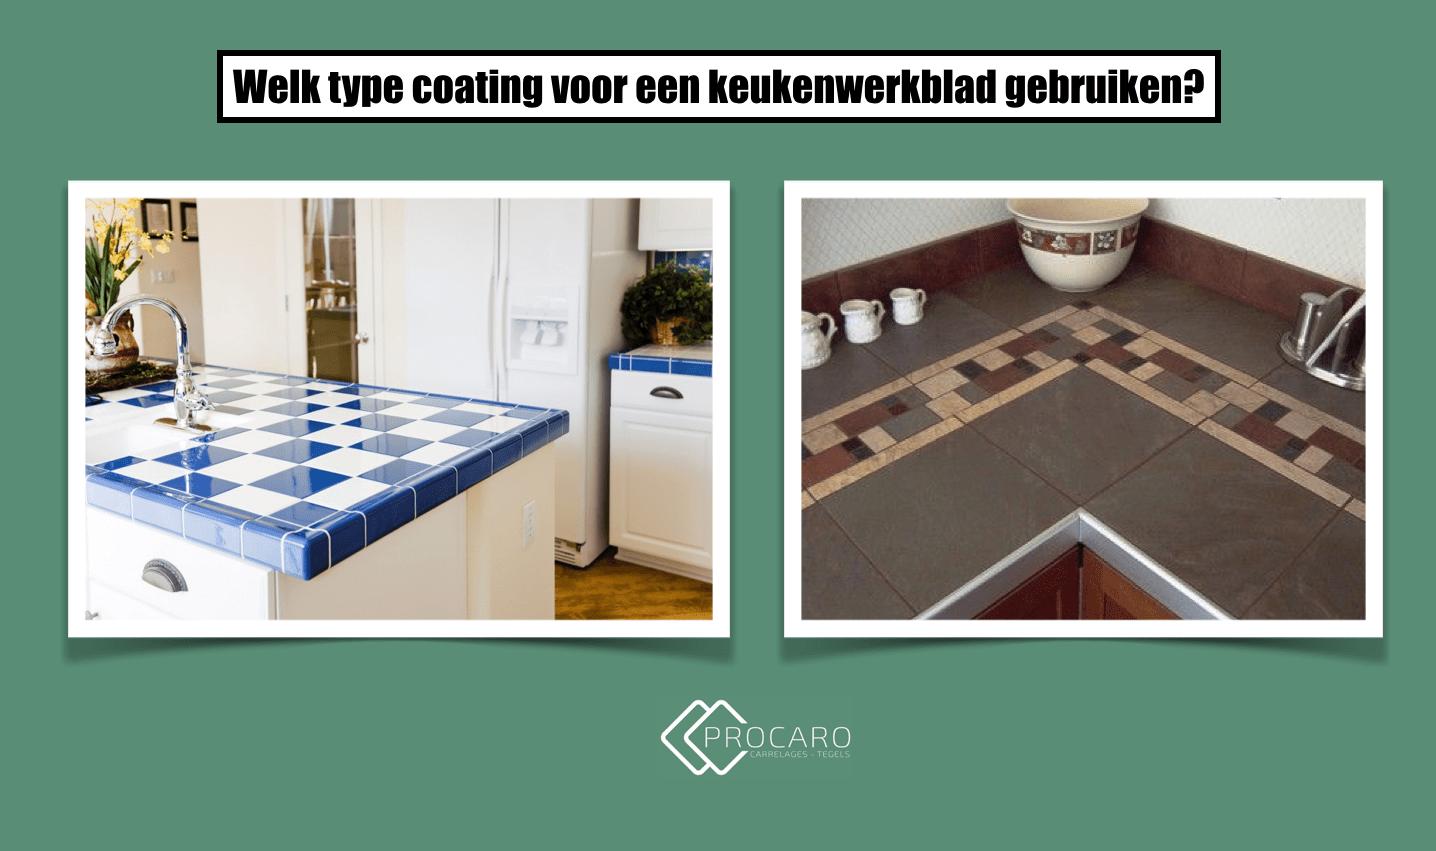 coating-keukenwerkblad-gebruiken